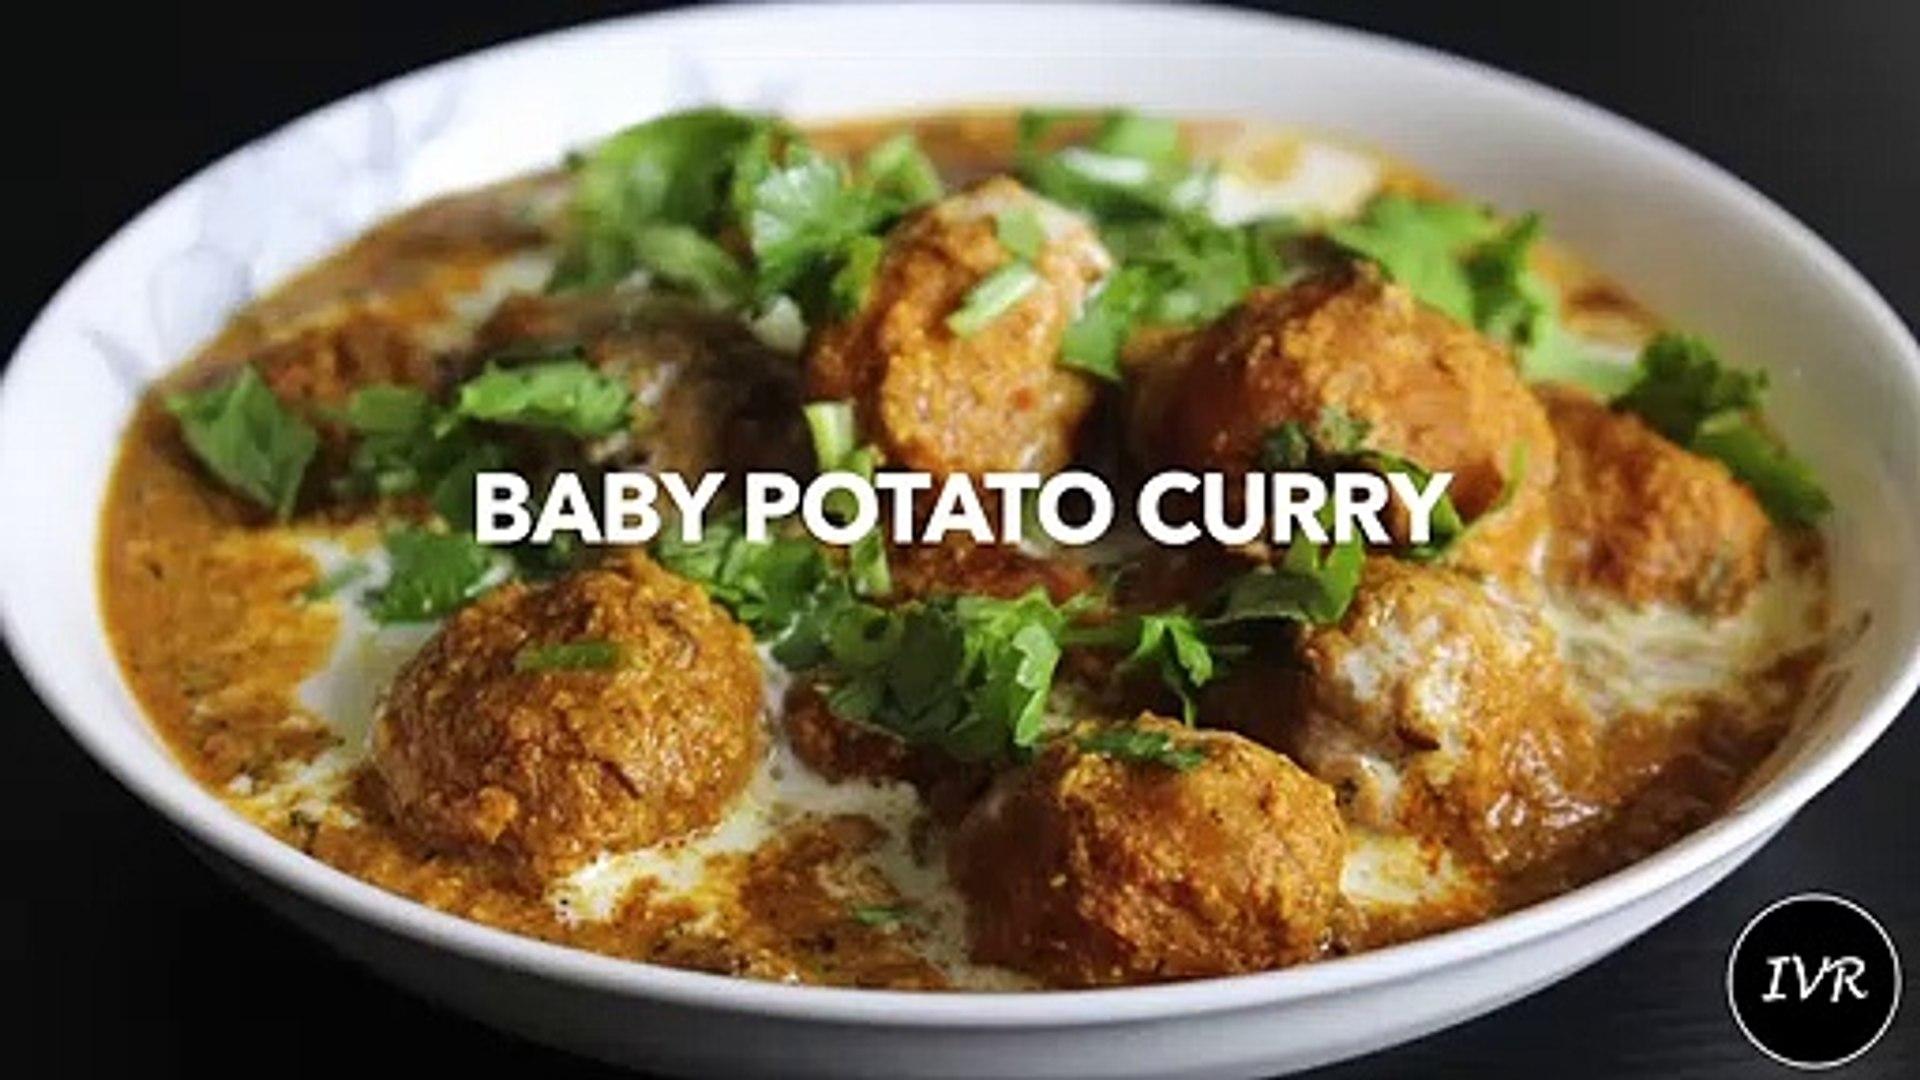 'Dum Aloo Recipe' - Baby Potato Curry Recipe - Shahi Aloo Dum Recipe - Indian Potato Curry